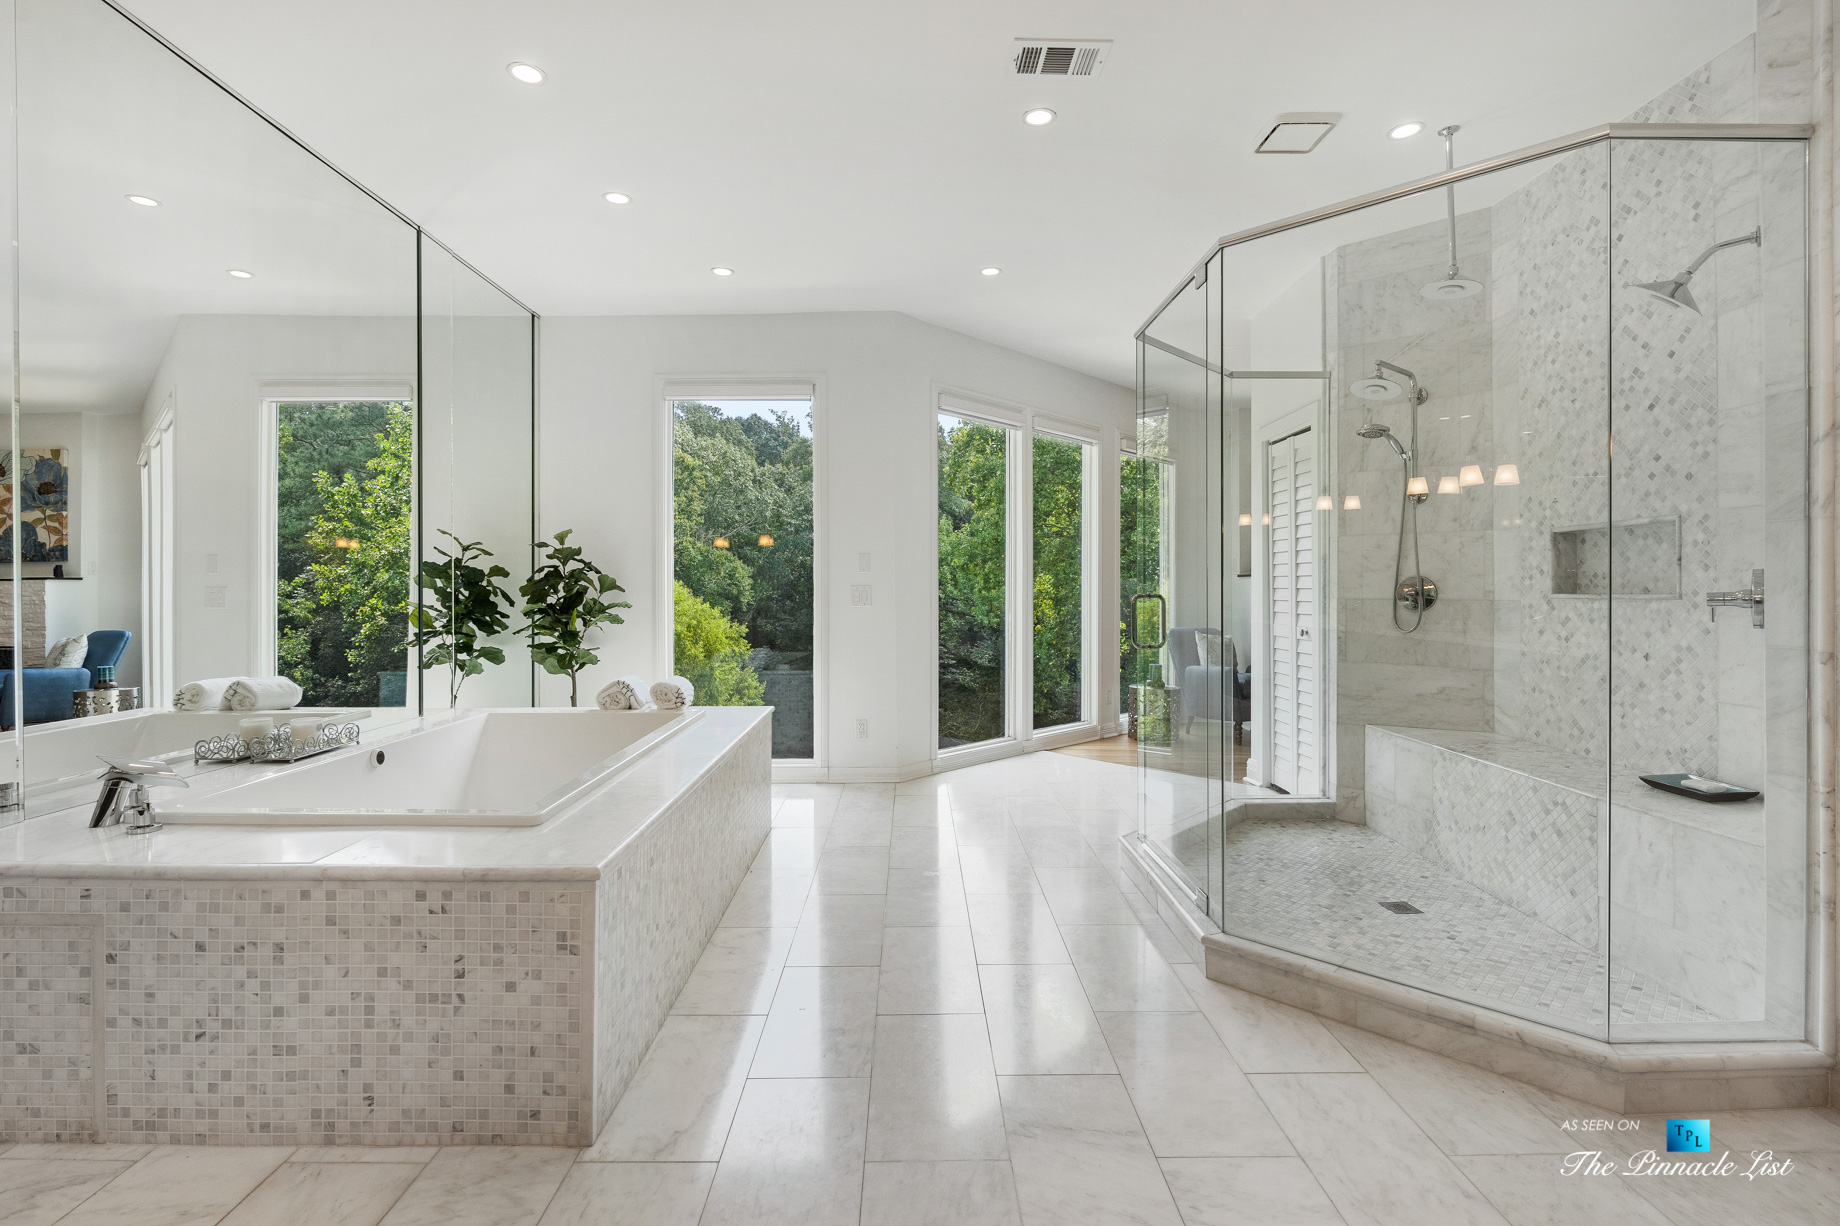 3906 Paces Ferry Rd NW, Atlanta, GA, USA - Master Bathroom Tub and Shower - Luxury Real Estate - Buckhead Home